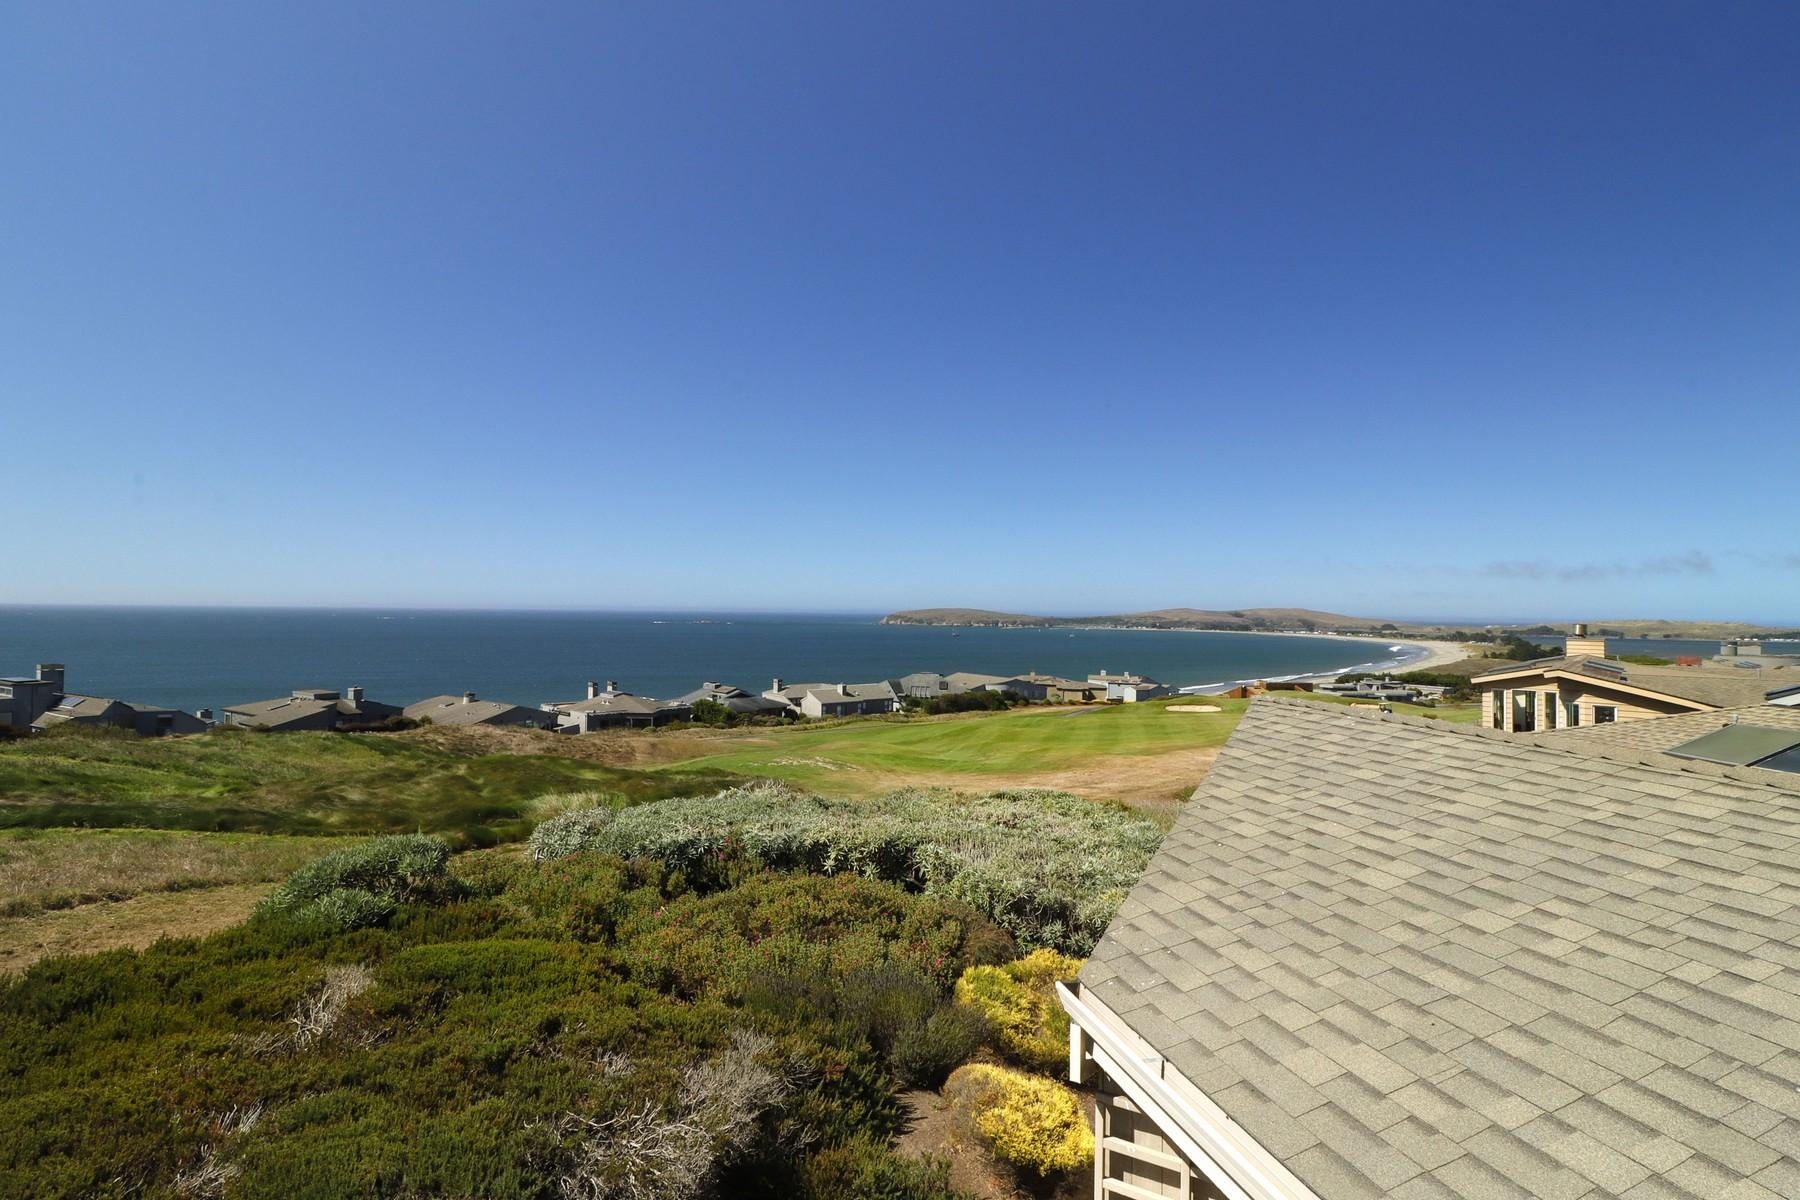 Single Family Homes for Sale at 940 Gull Drive Bodega Bay, California 94923 United States